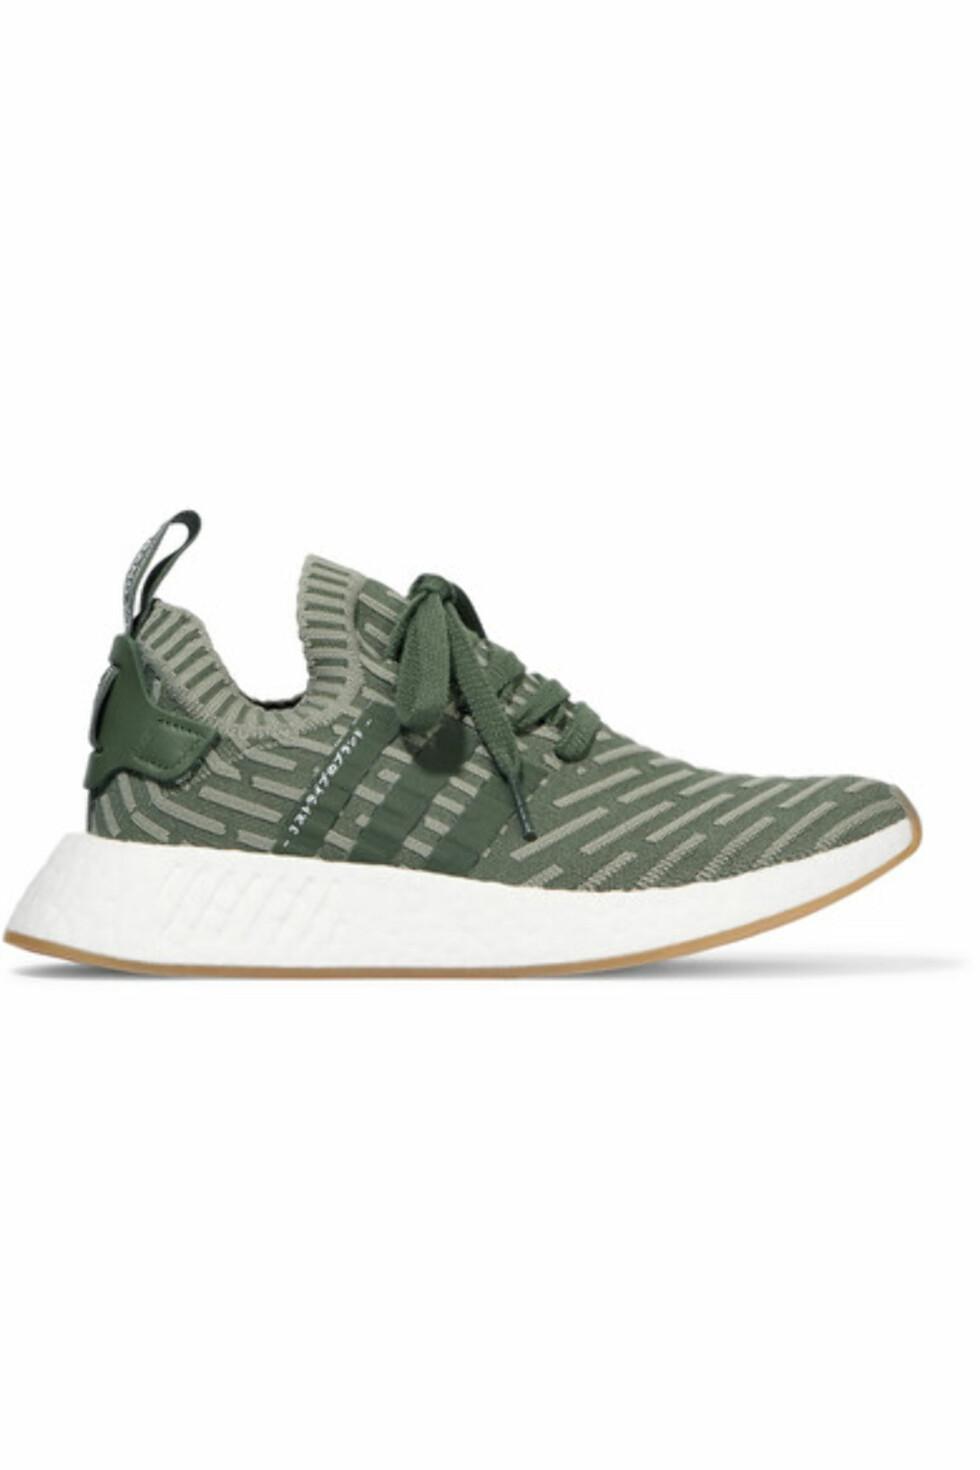 Sko fra Adidas |1700,-| https://www.net-a-porter.com/no/en/product/910378/adidas_originals/nmd-r2-leather-trimmed-primeknit-sneakers